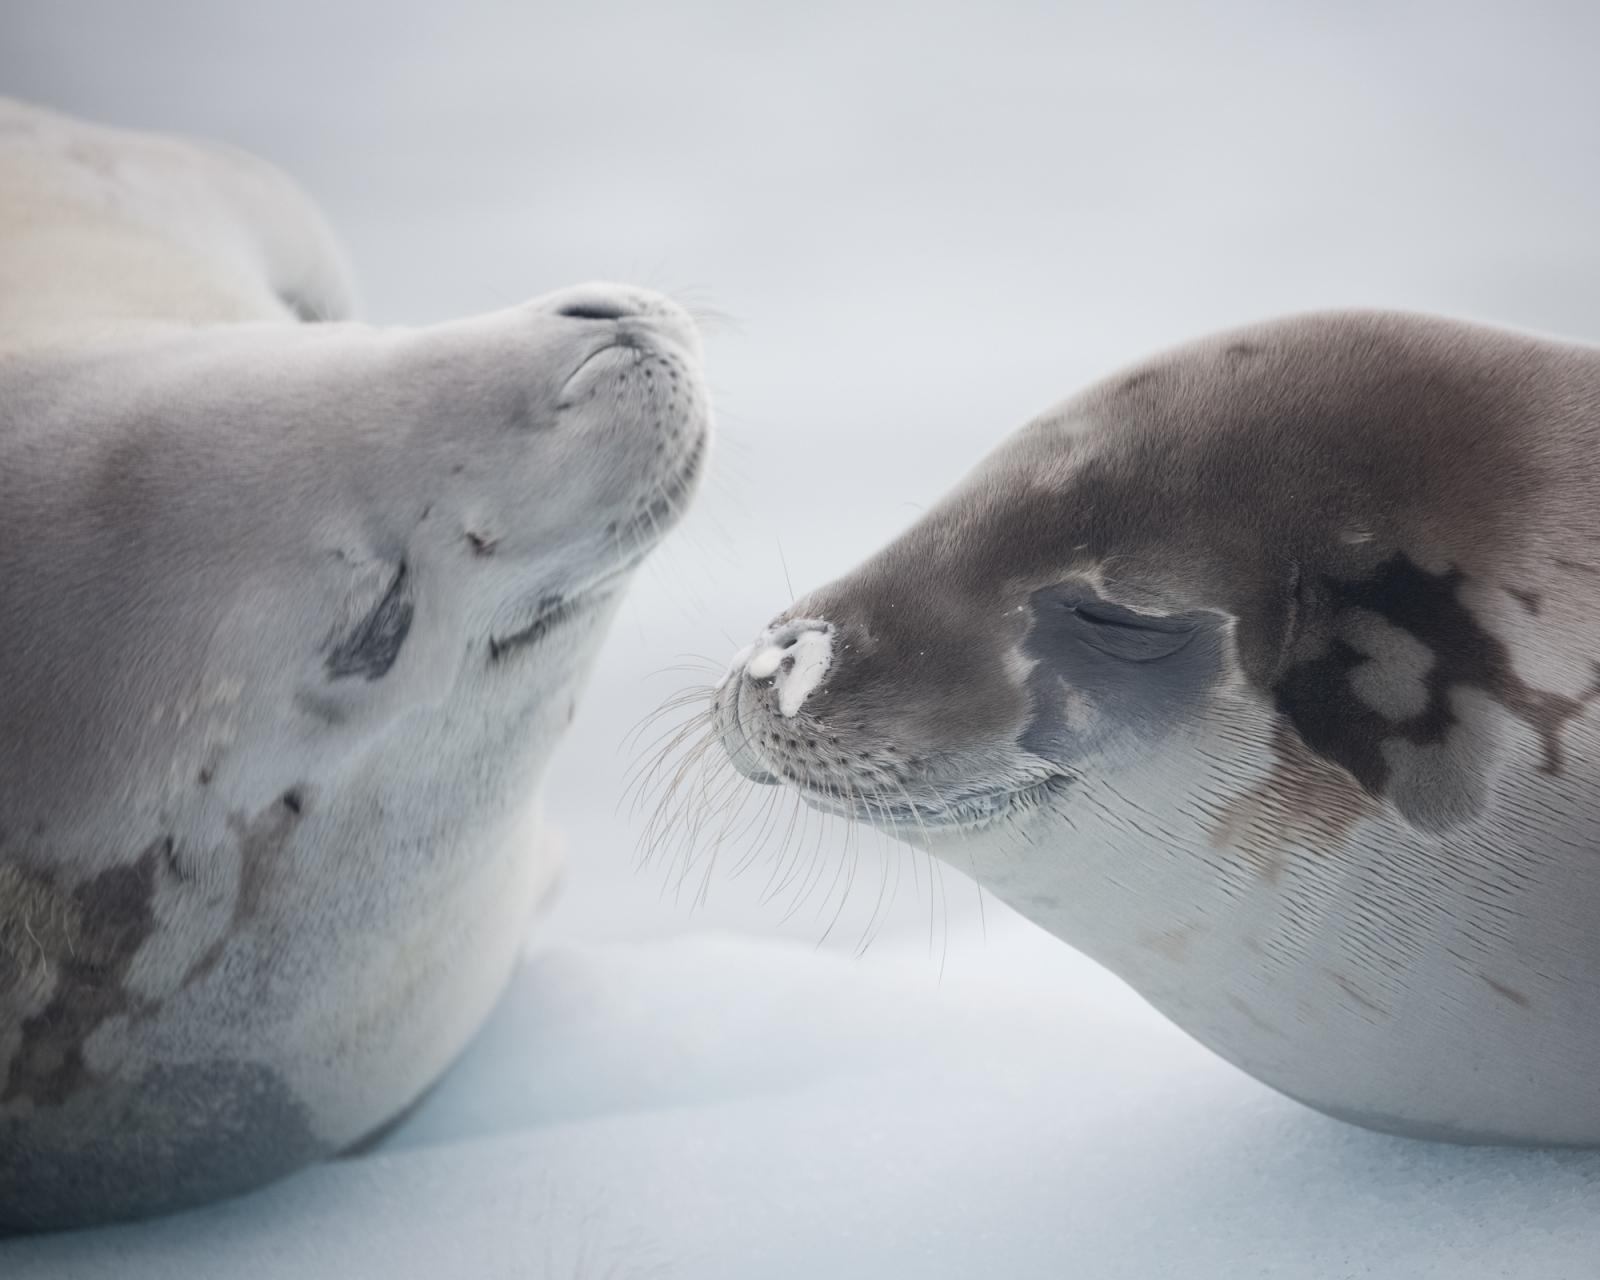 Two crabeater seals rest on an ice floe near Danco Island, Antarctica.